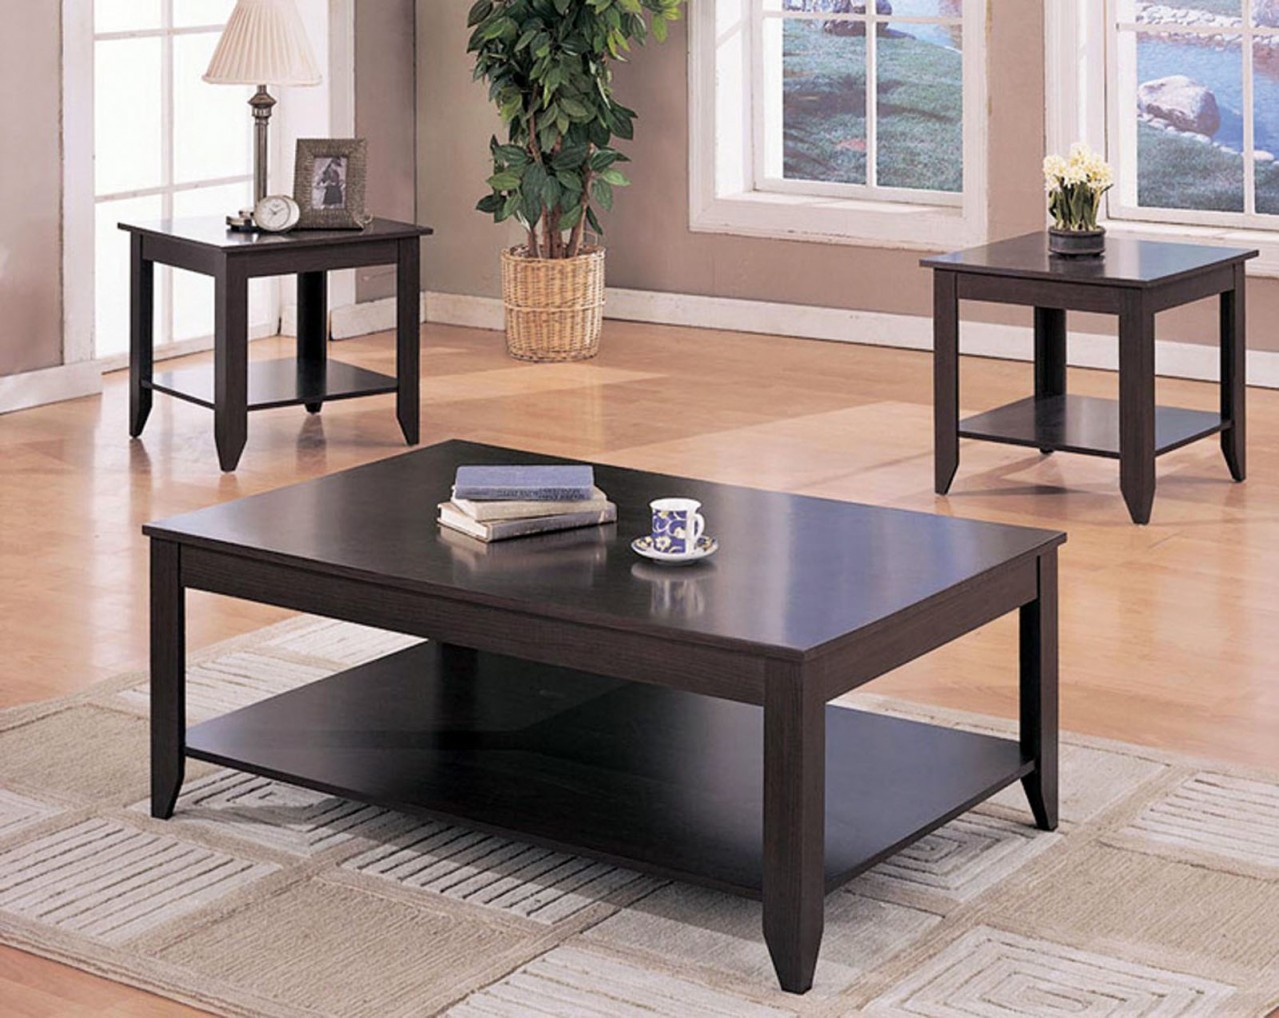 Agatha 3pc. Coffee Table Set